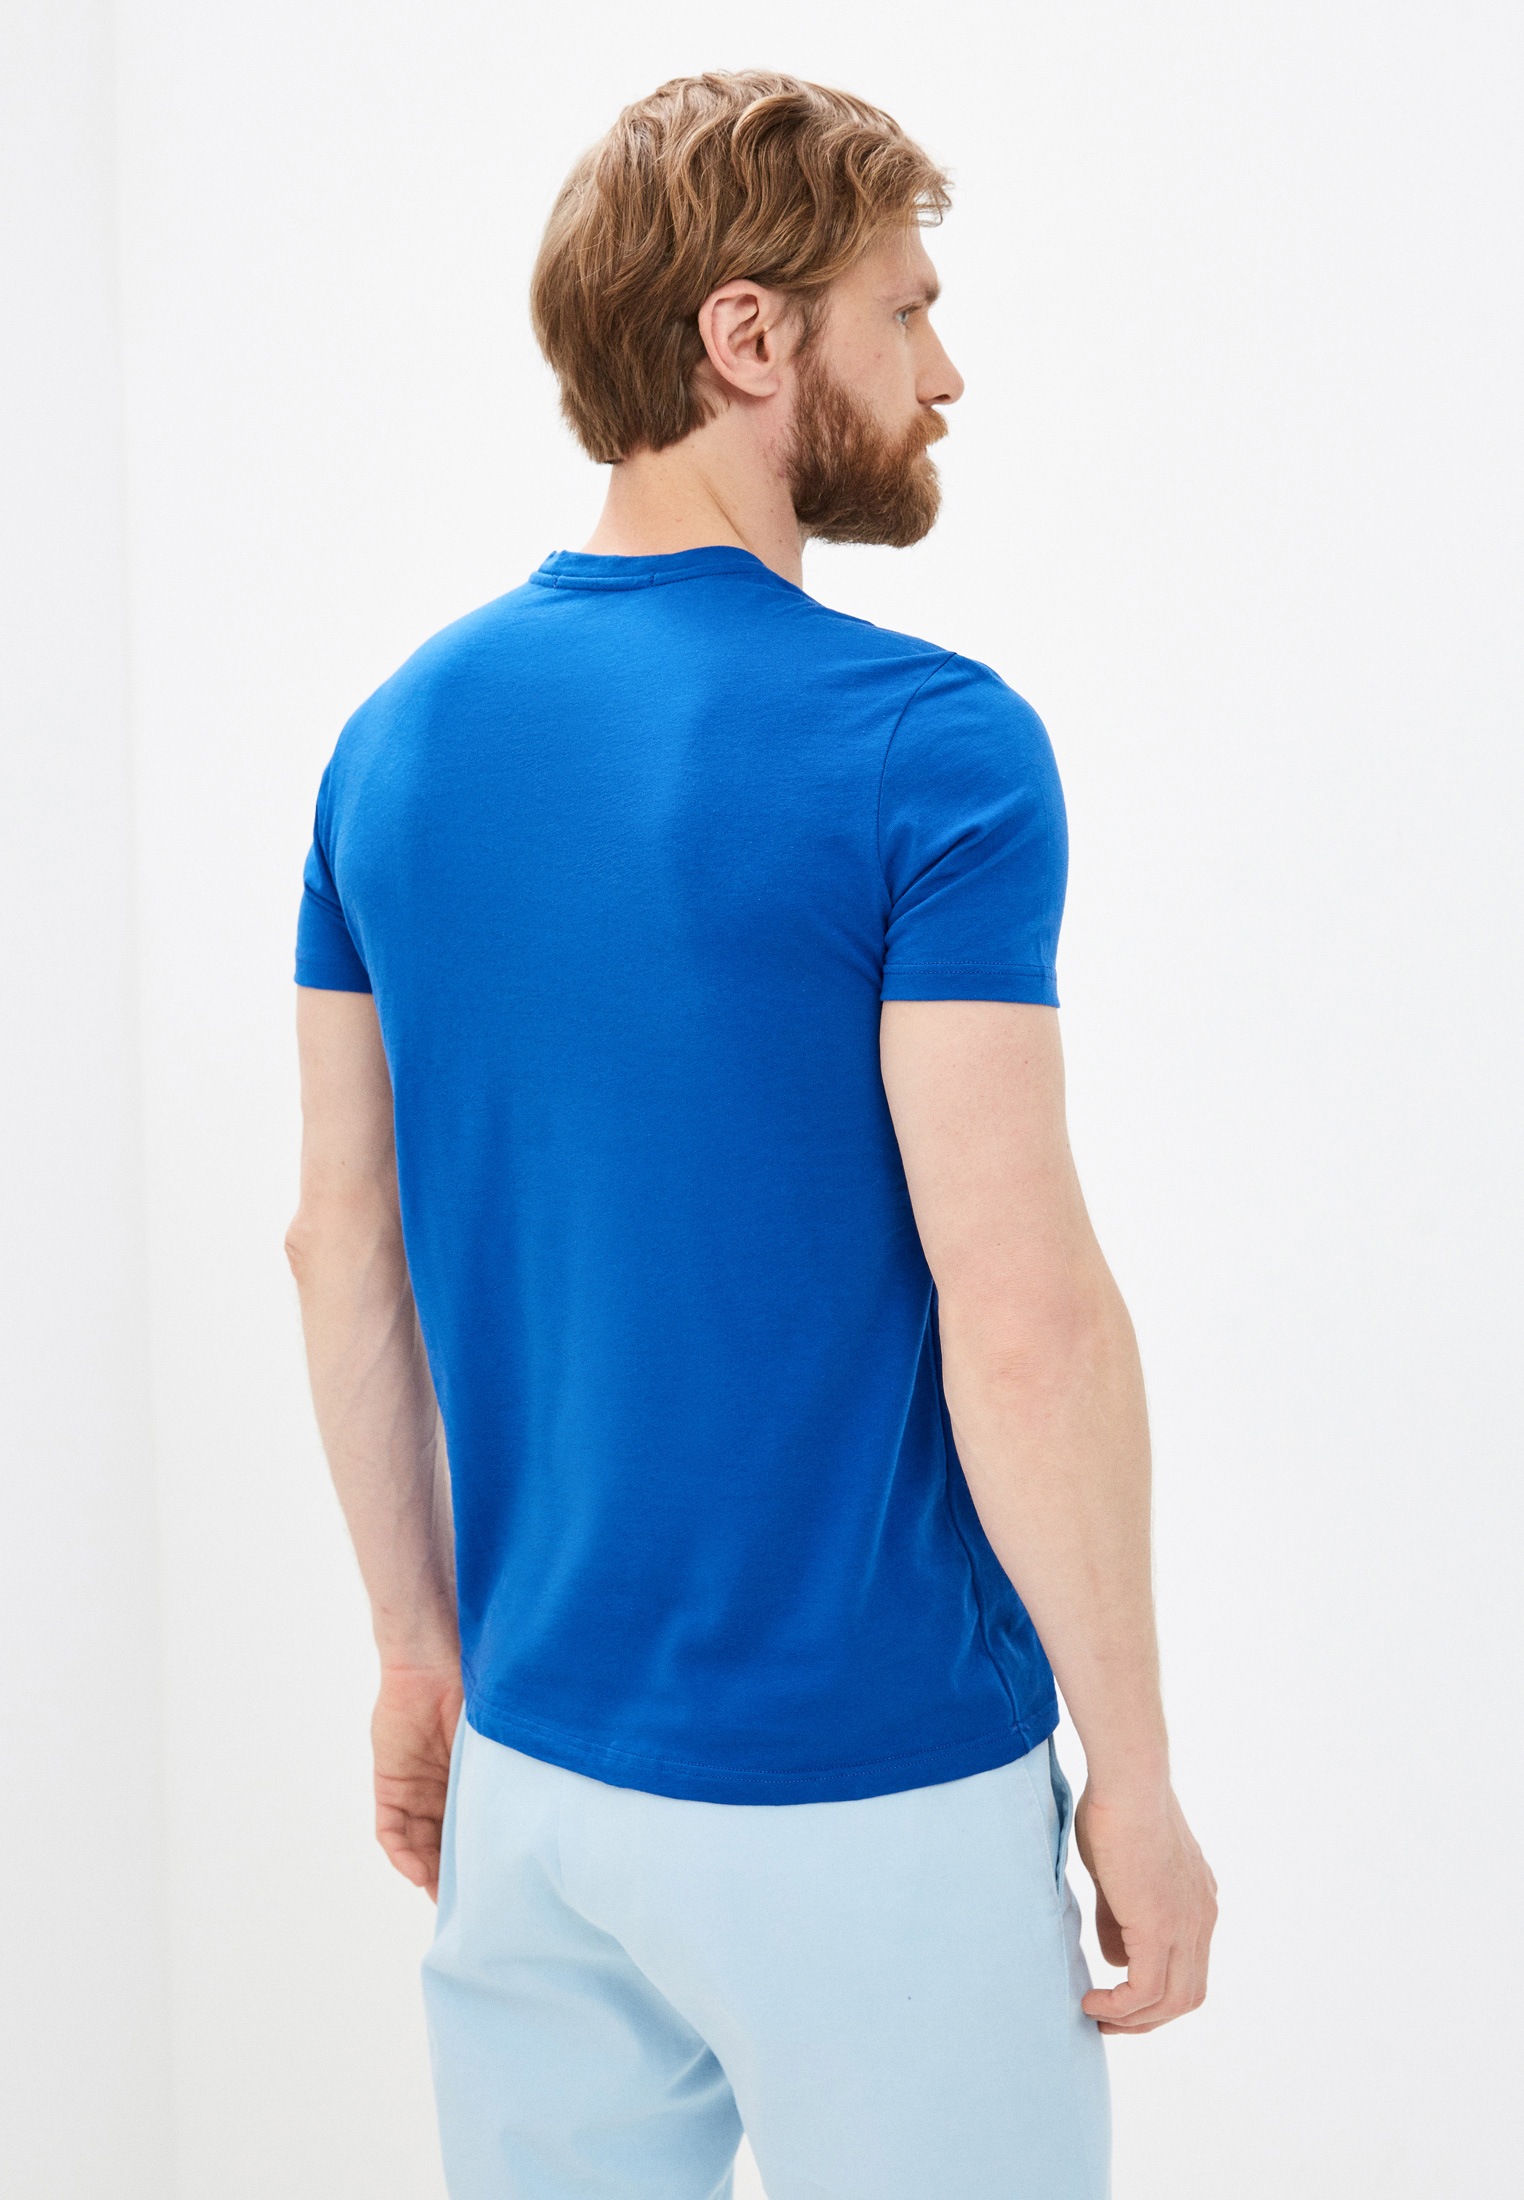 Мужская футболка Roberto Cavalli (Роберто Кавалли) GST655A027: изображение 4